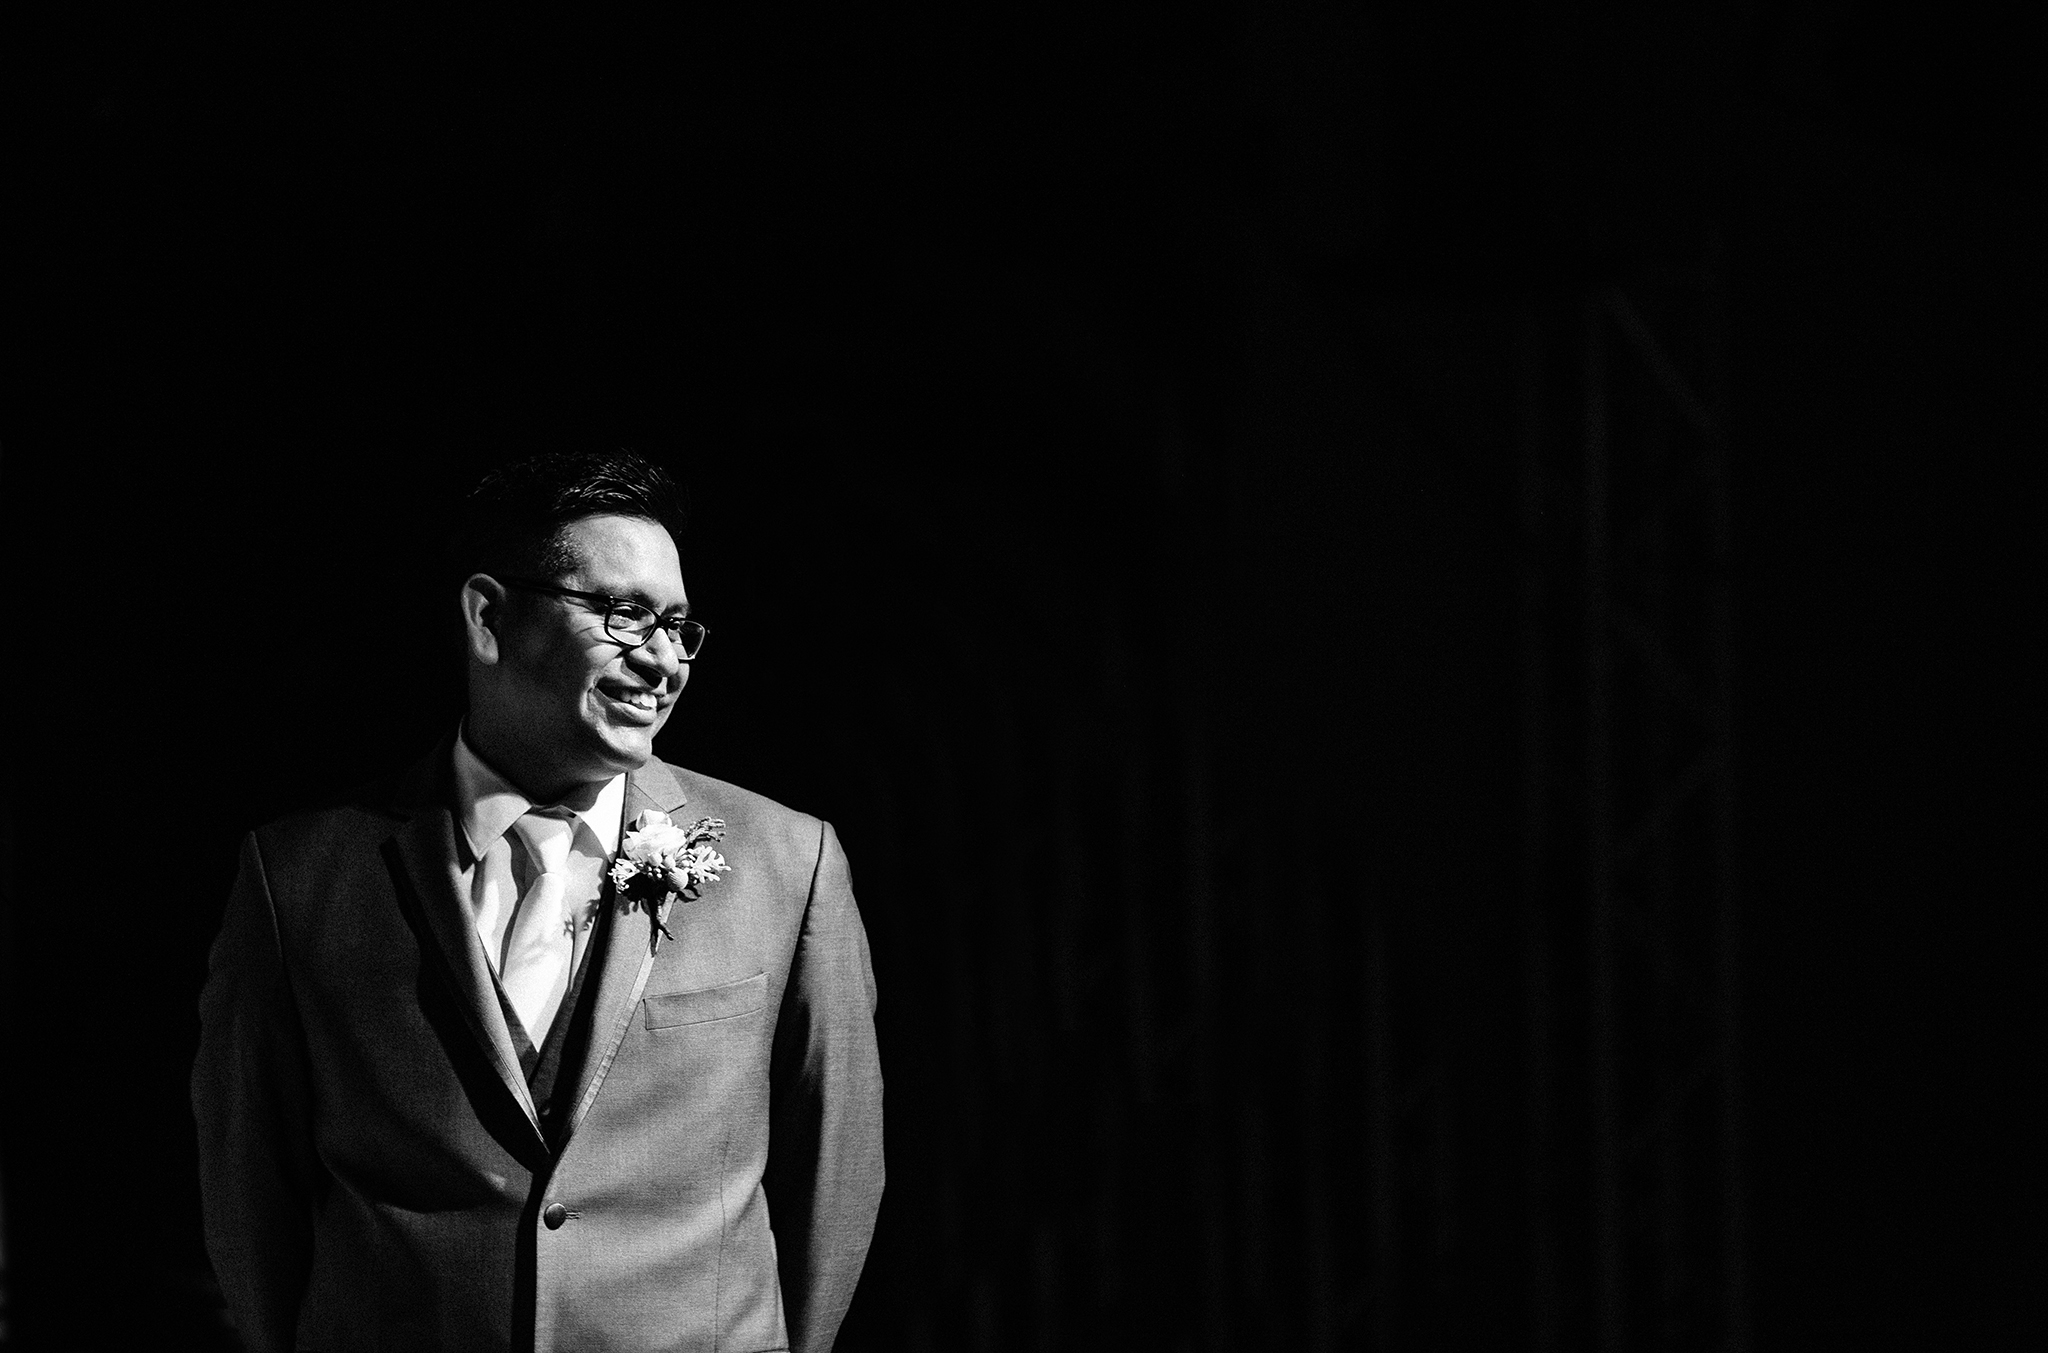 wedding ceremony, dramatic, edgy, bride's entrance, experience life church